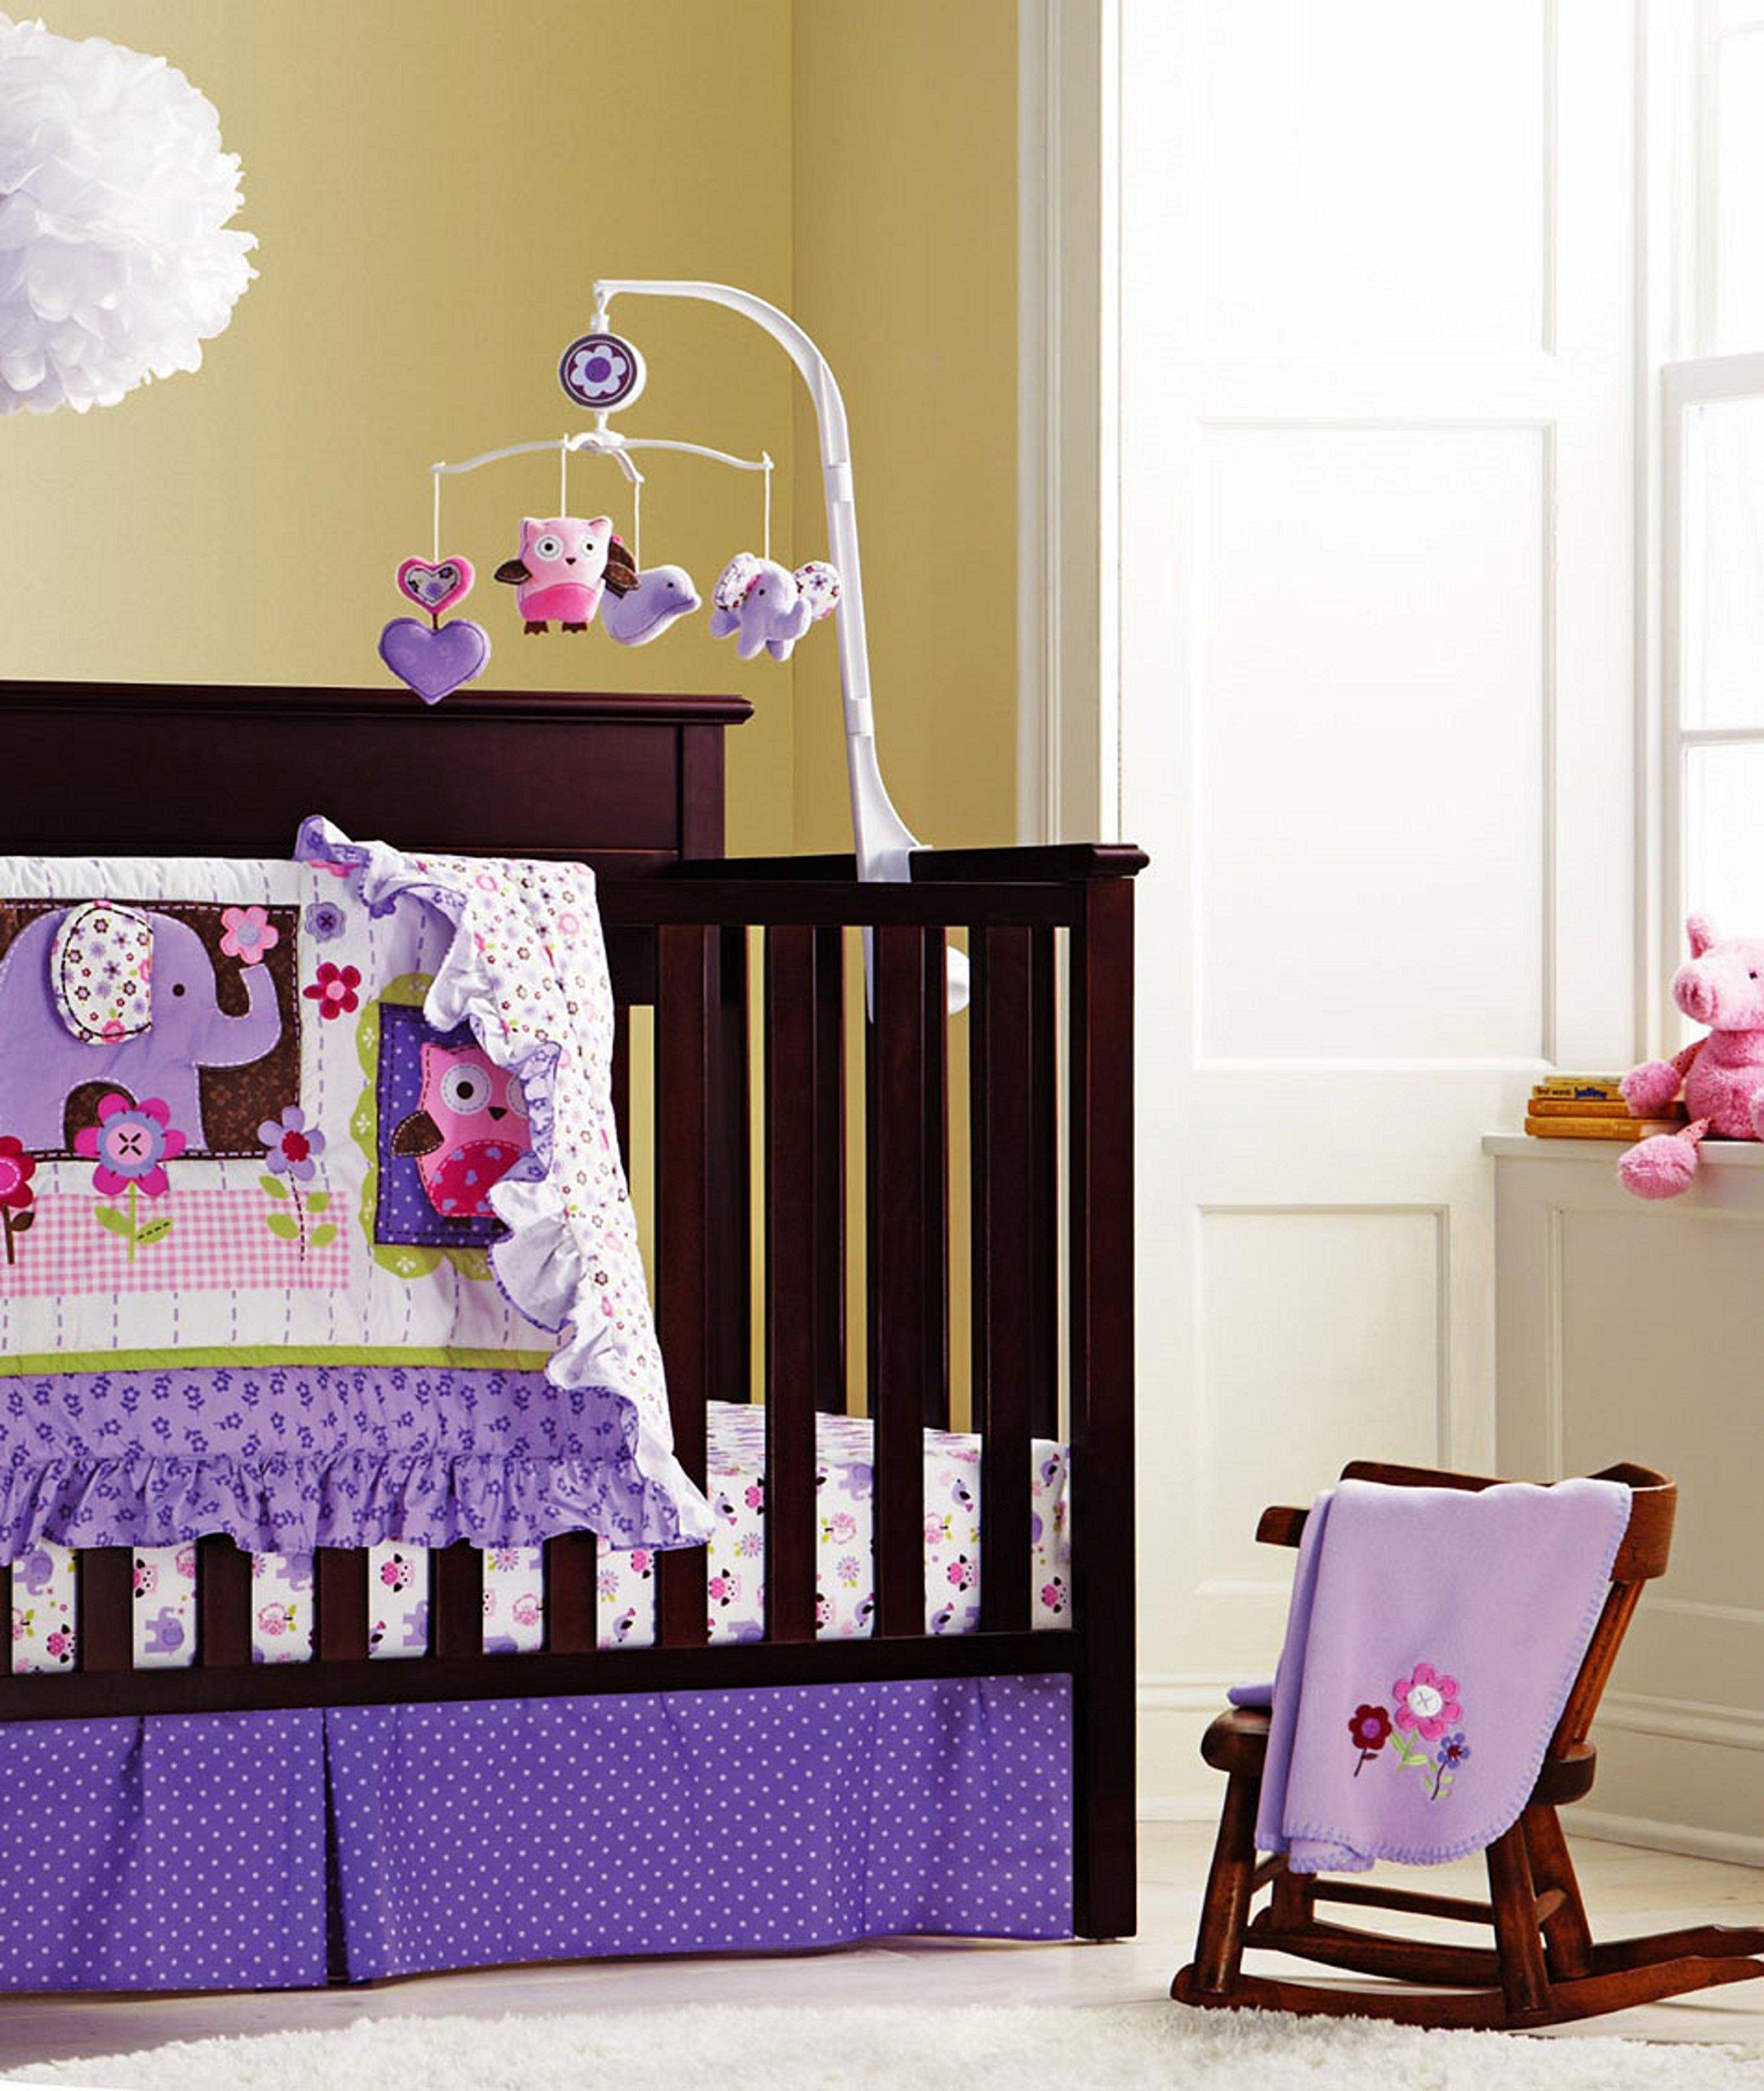 Baby Girls Purple Owl 9pcs Crib Bedding Set with diaper stacker by WM